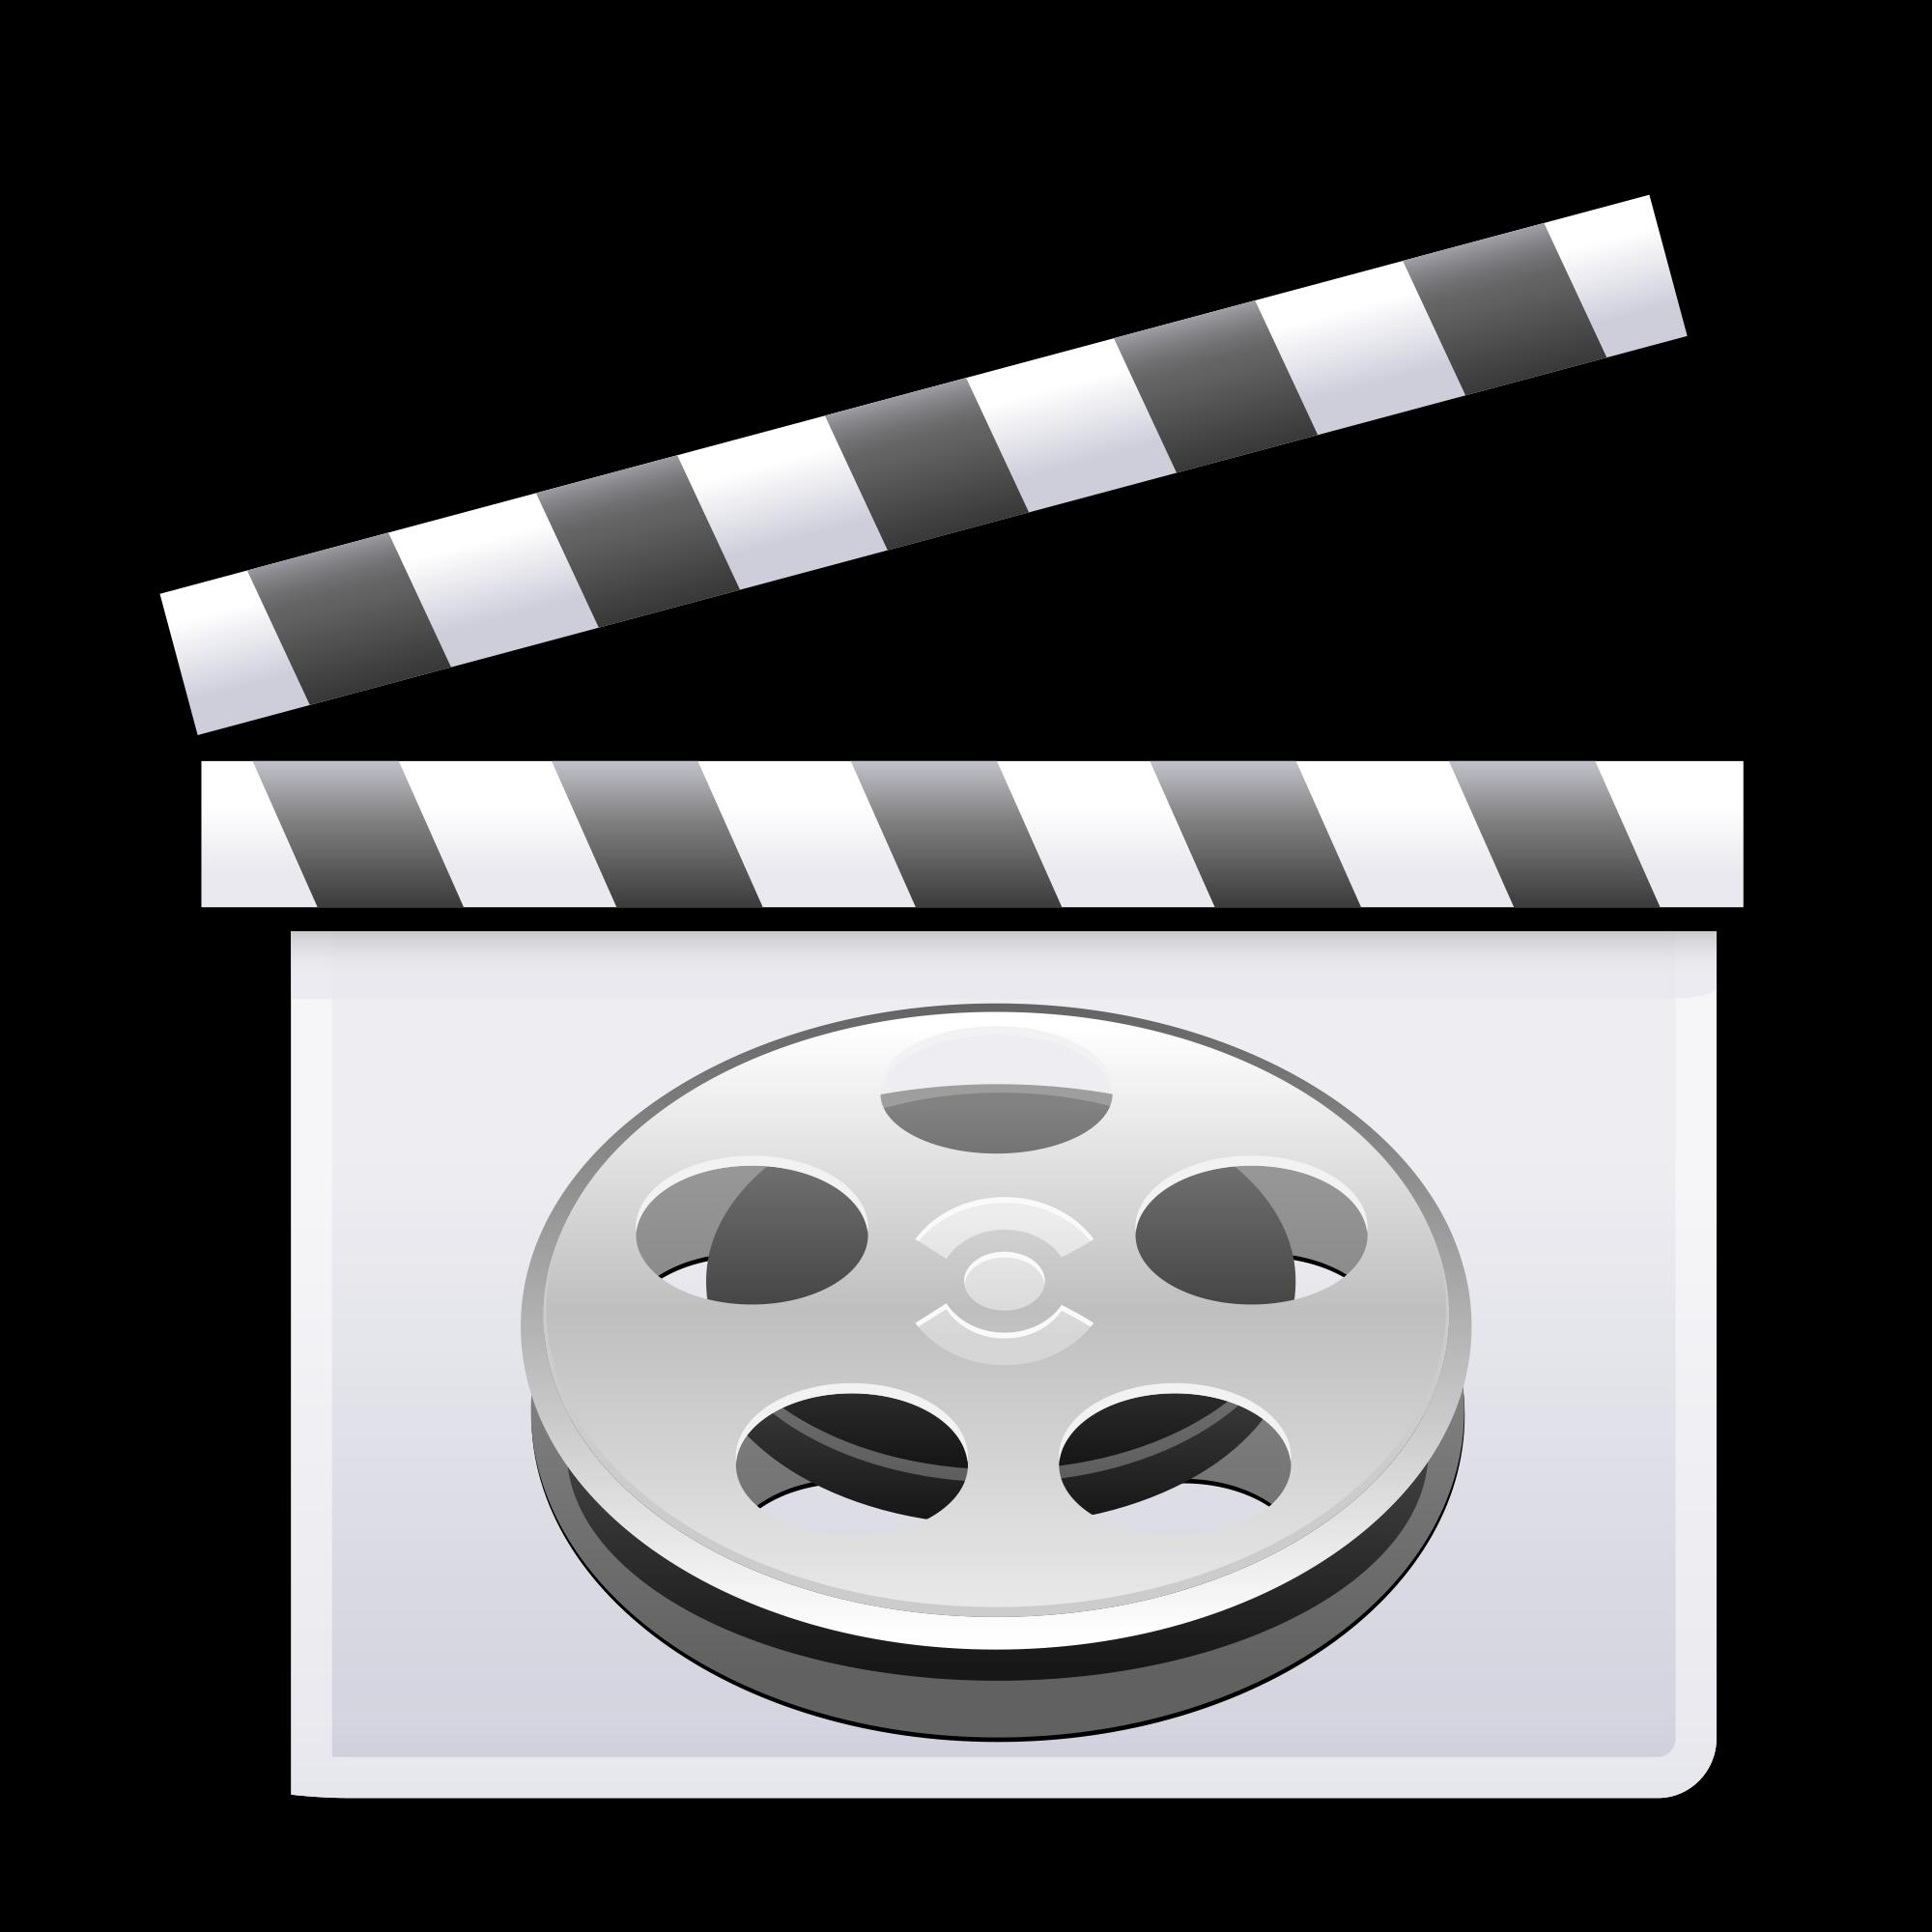 Film Reel Png - ClipArt Best